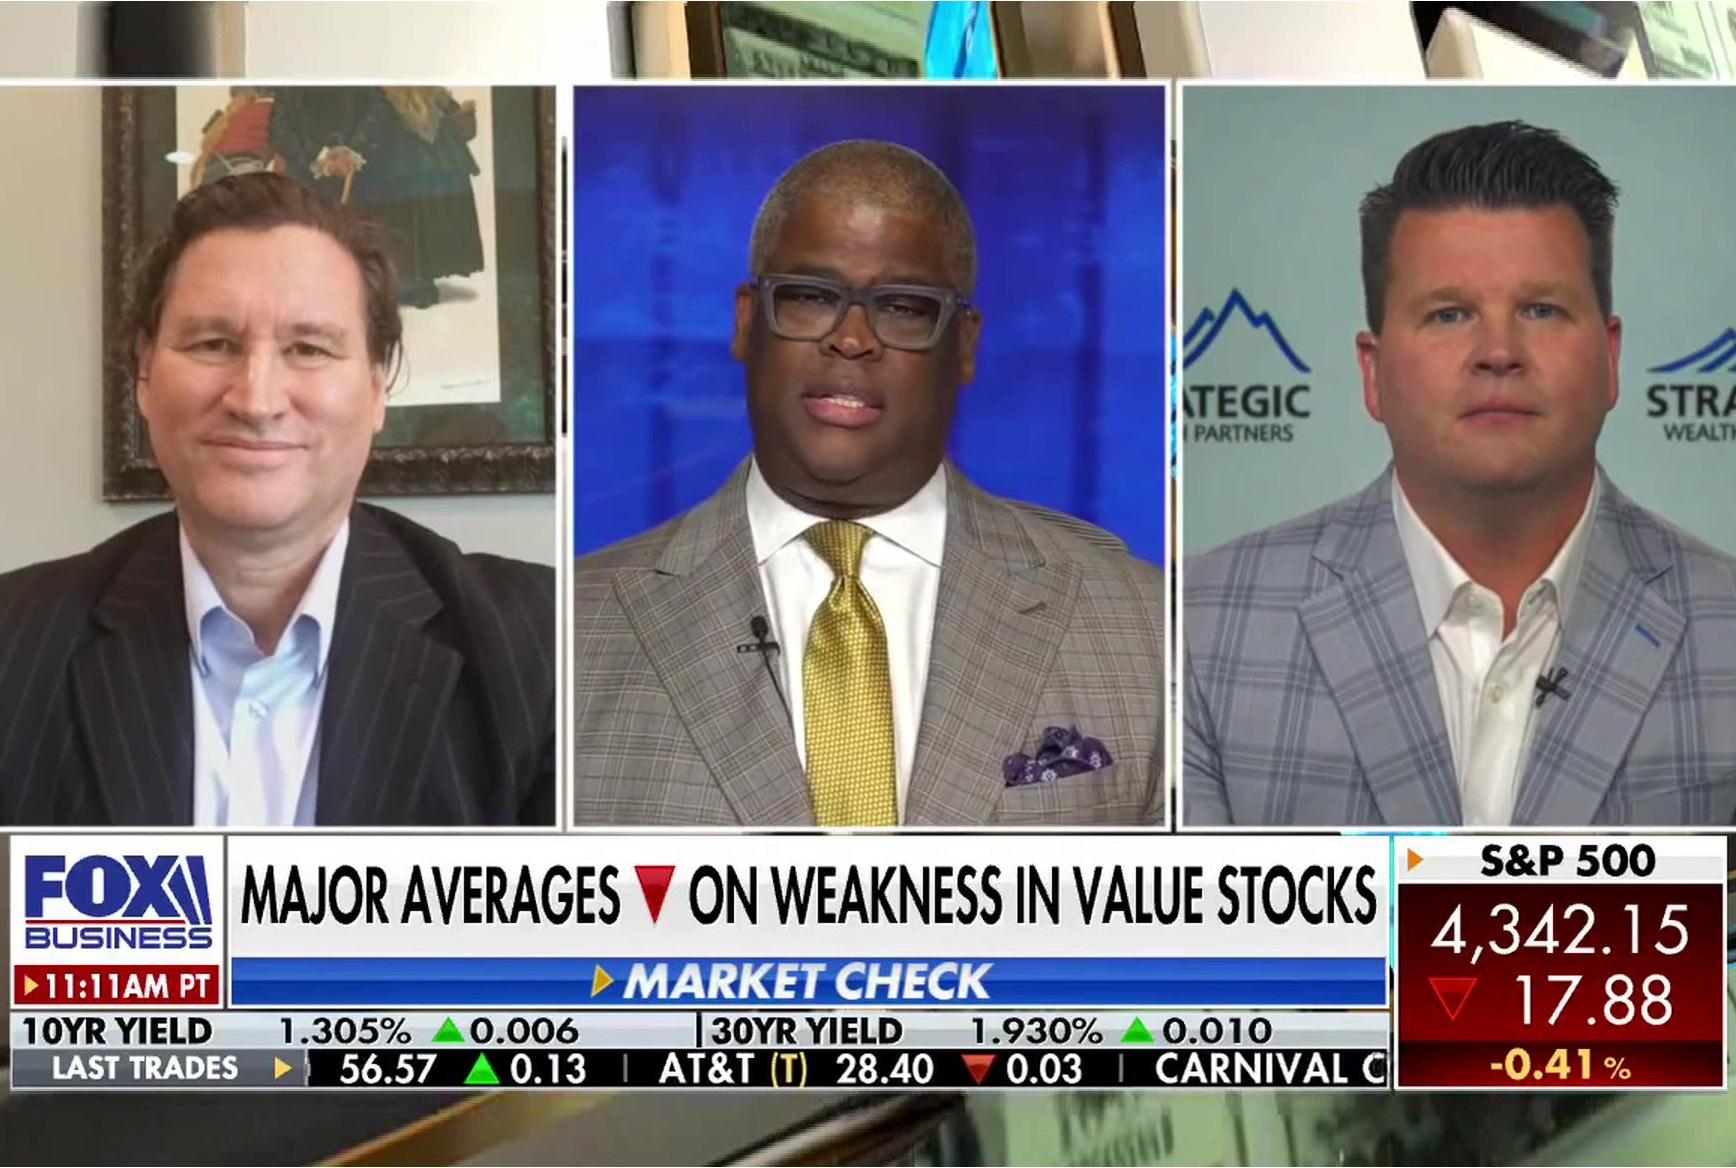 Major Averages Lower on Weakness In Value Stocks